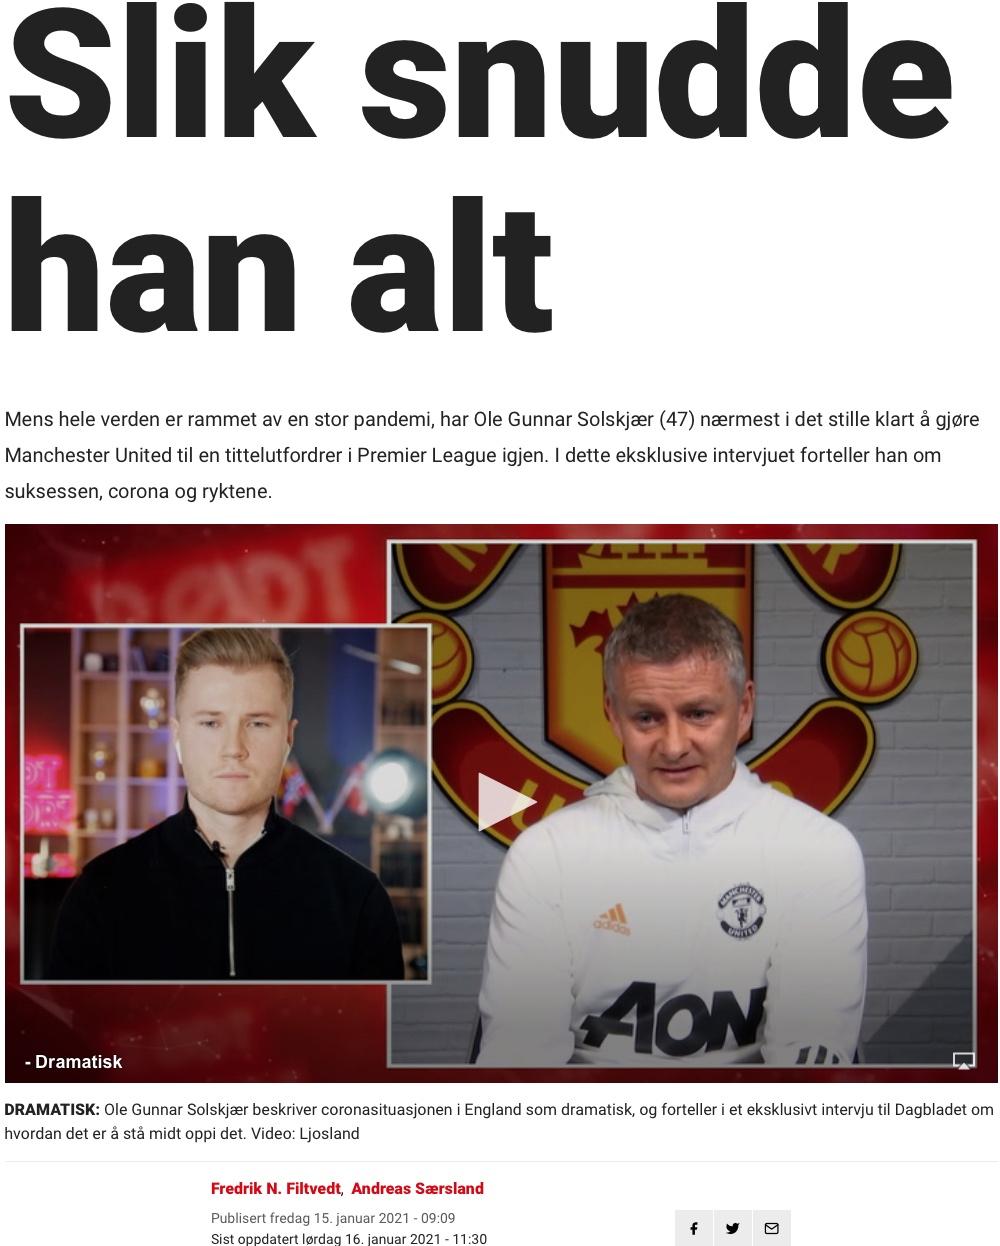 Solskjær Dagbladet Slik snudde han alt.